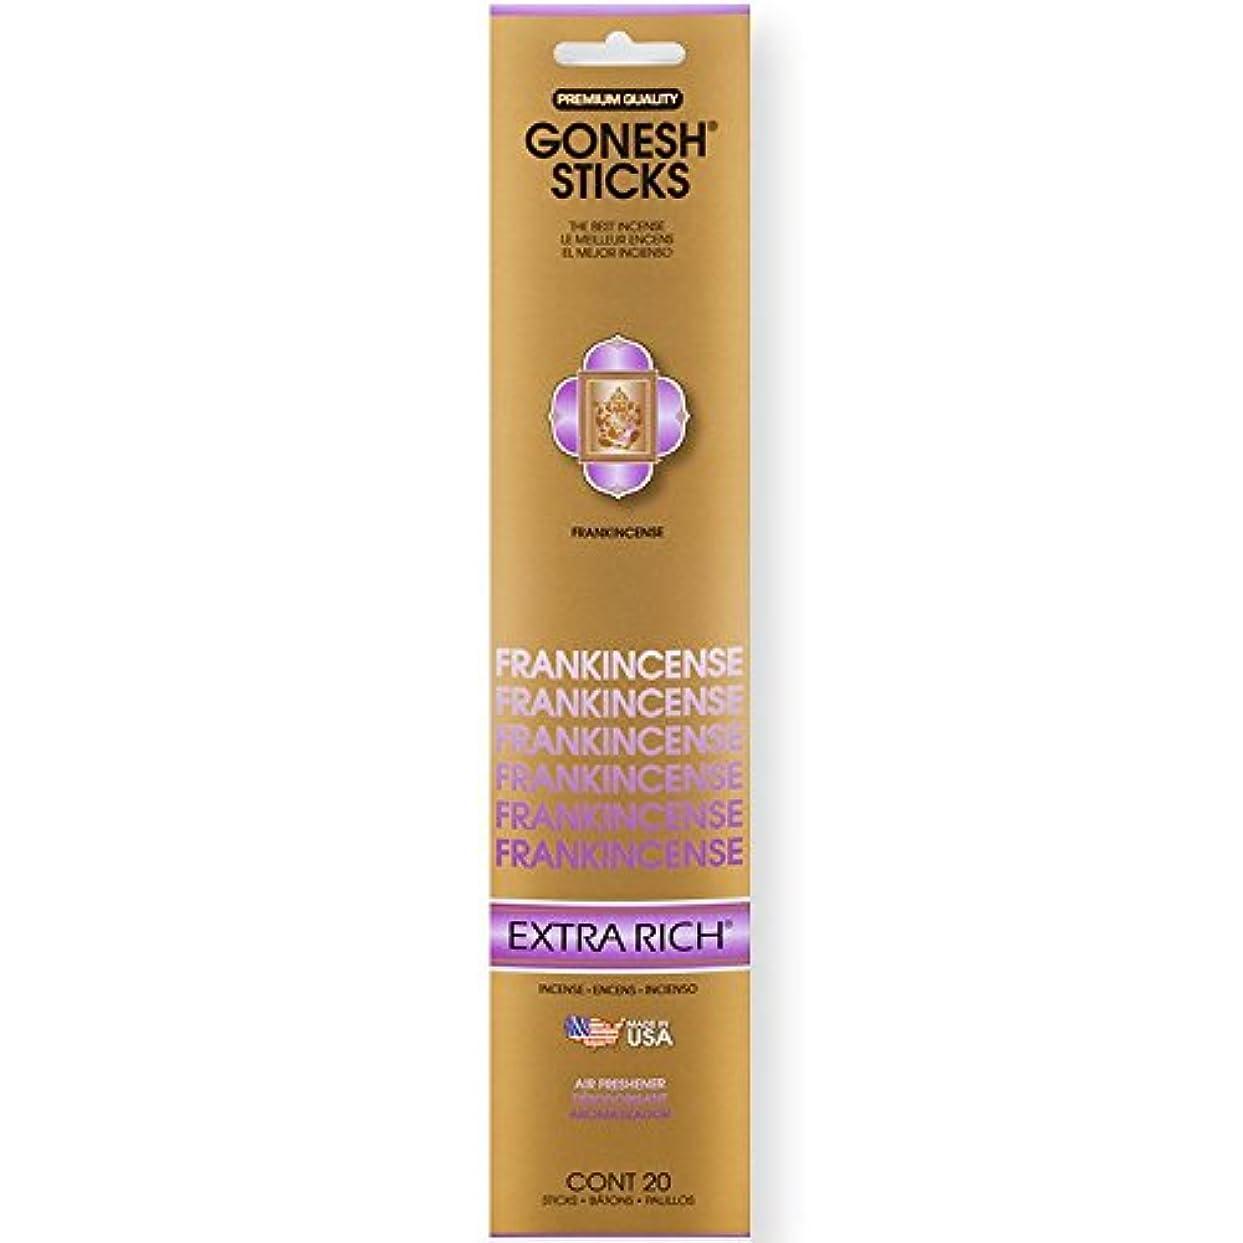 Gonesh Incense Sticks Extra Richコレクションバルク – Frankincense 12パック合計240 )